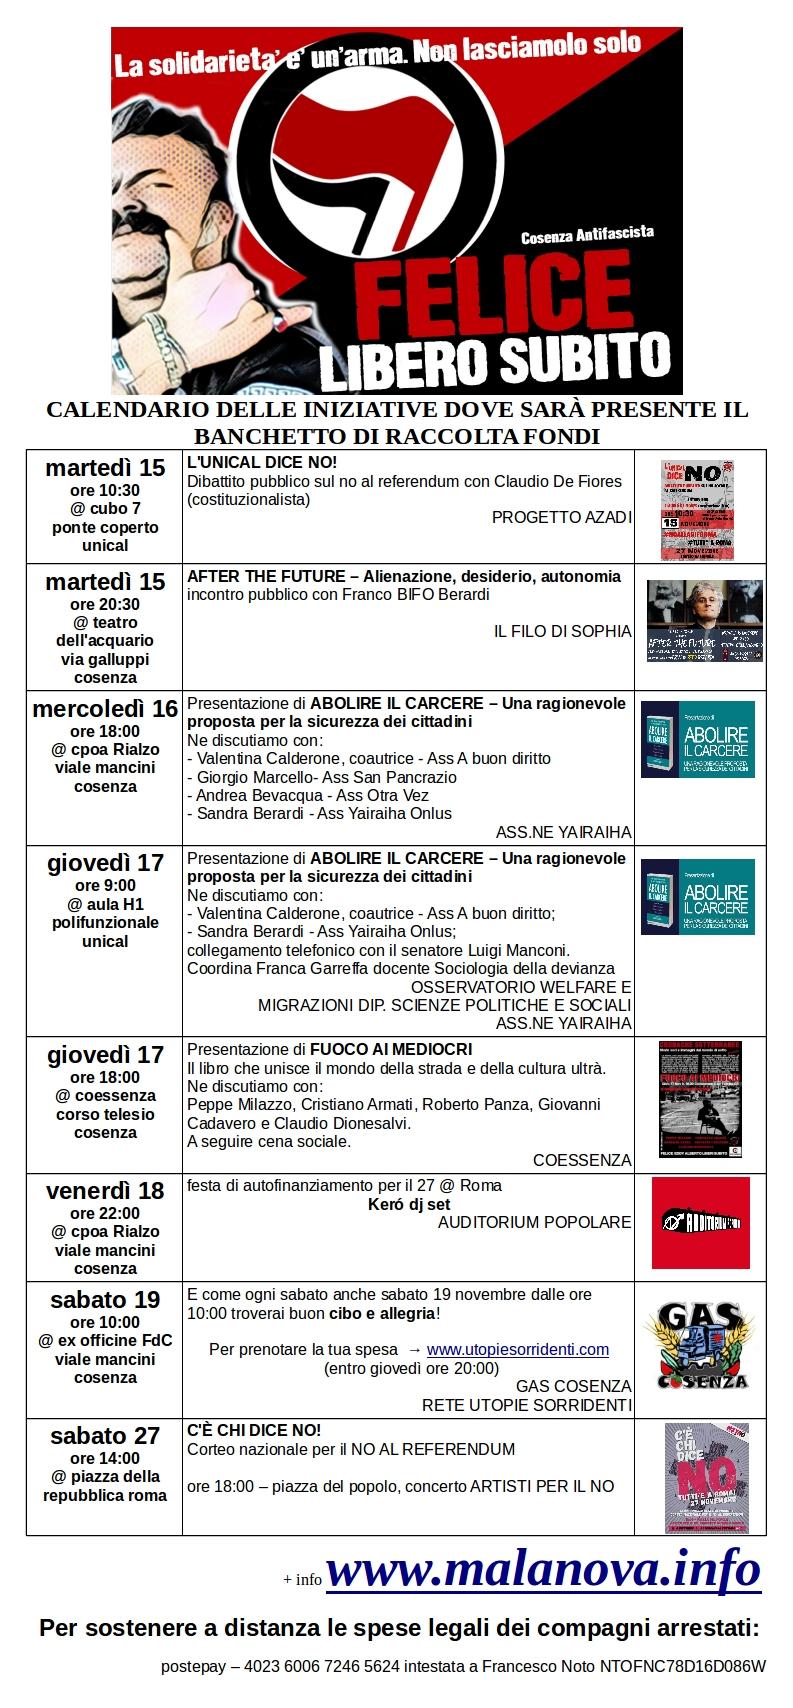 felice-libero-calendario-banchetti